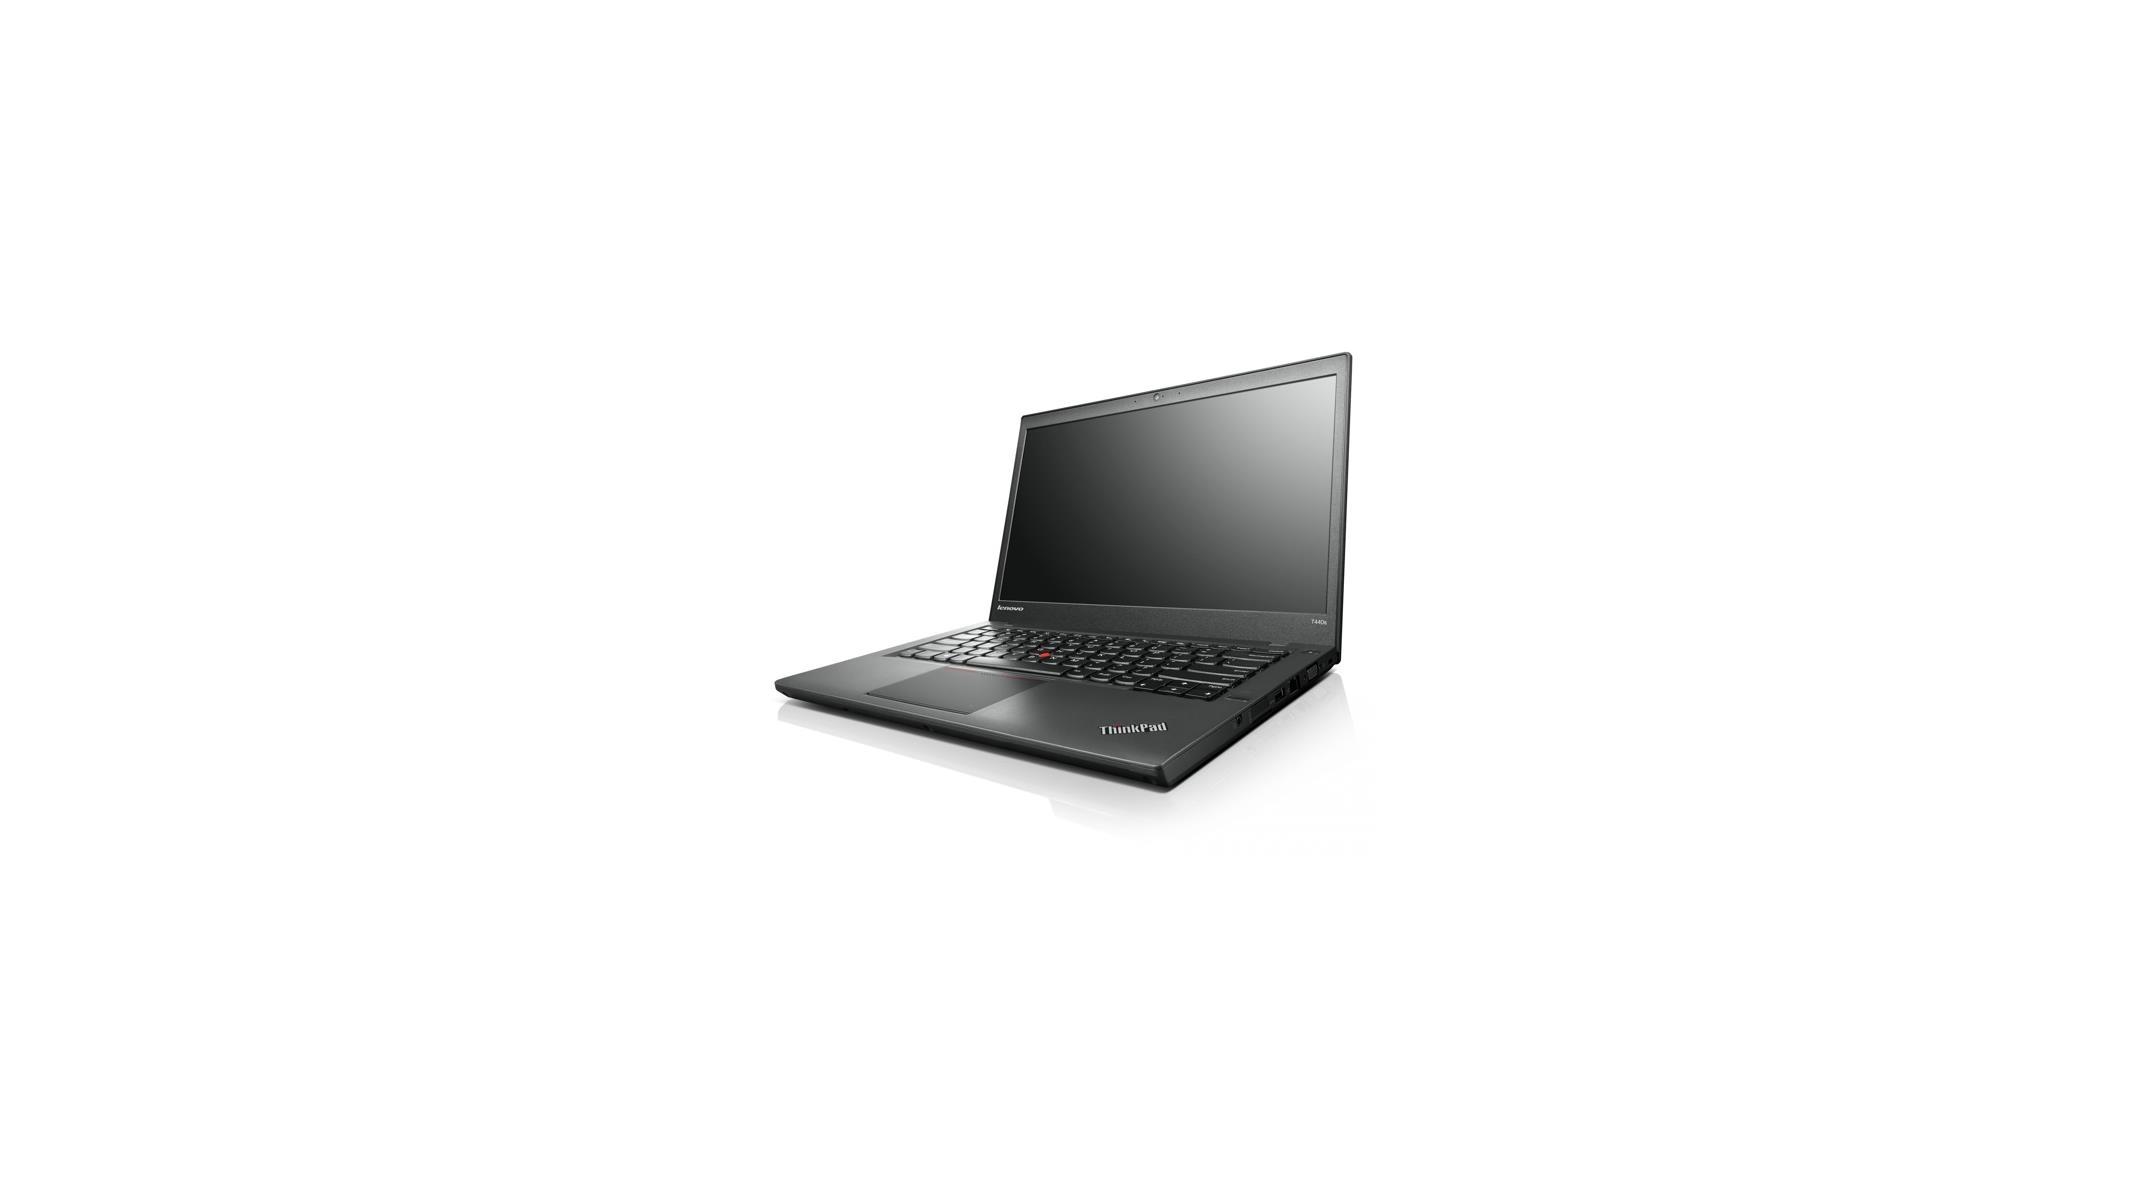 Lenovo Issues Software Update For Serious ThinkPad Fingerprint